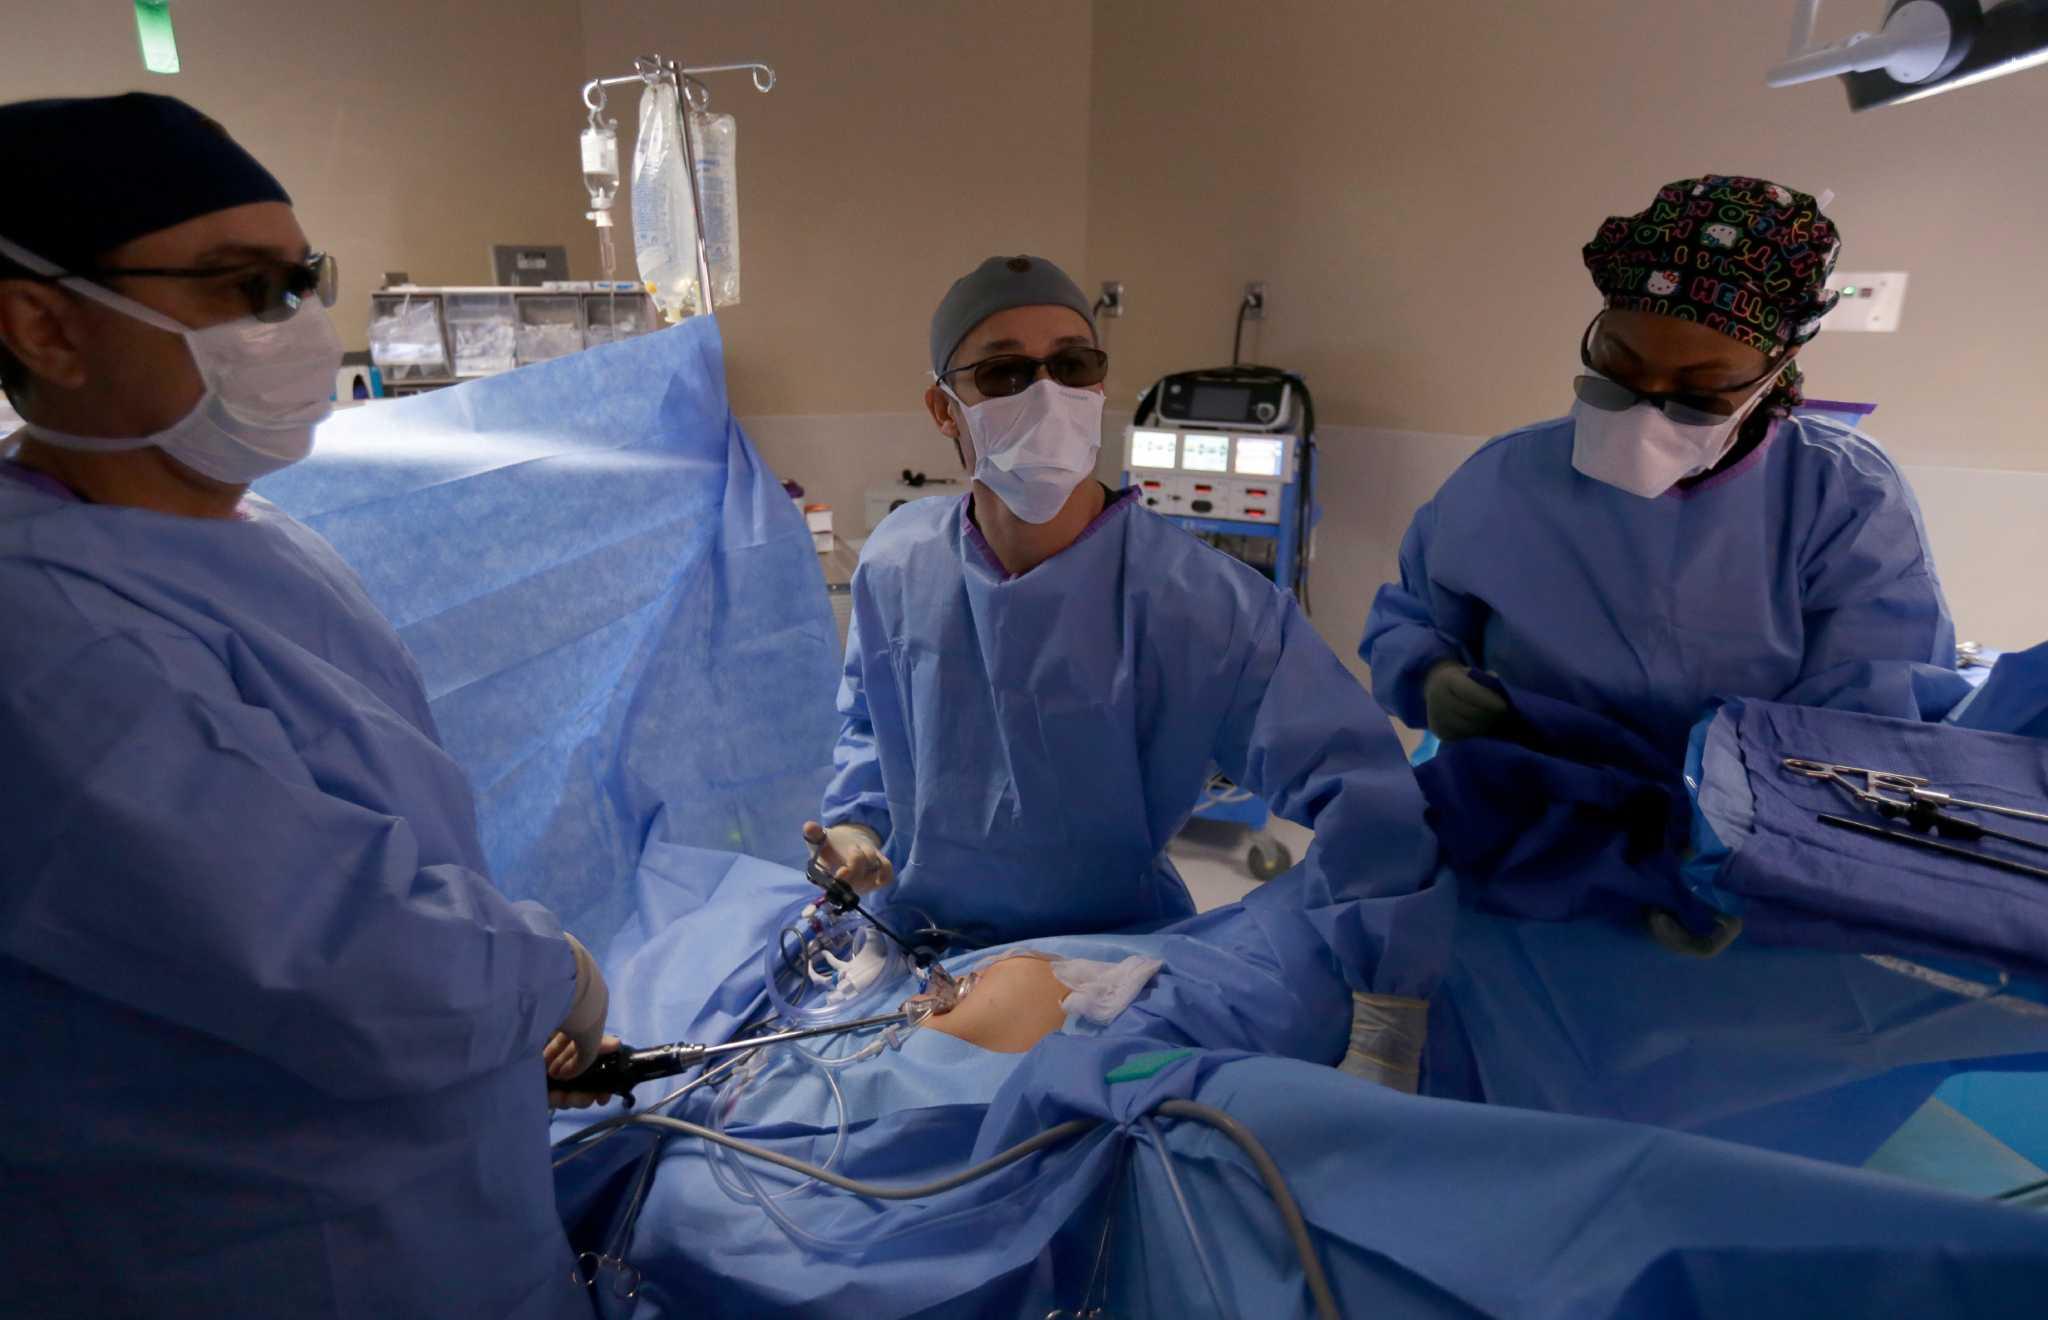 3 D Imaging Could Benefit Laparoscopic Surgery